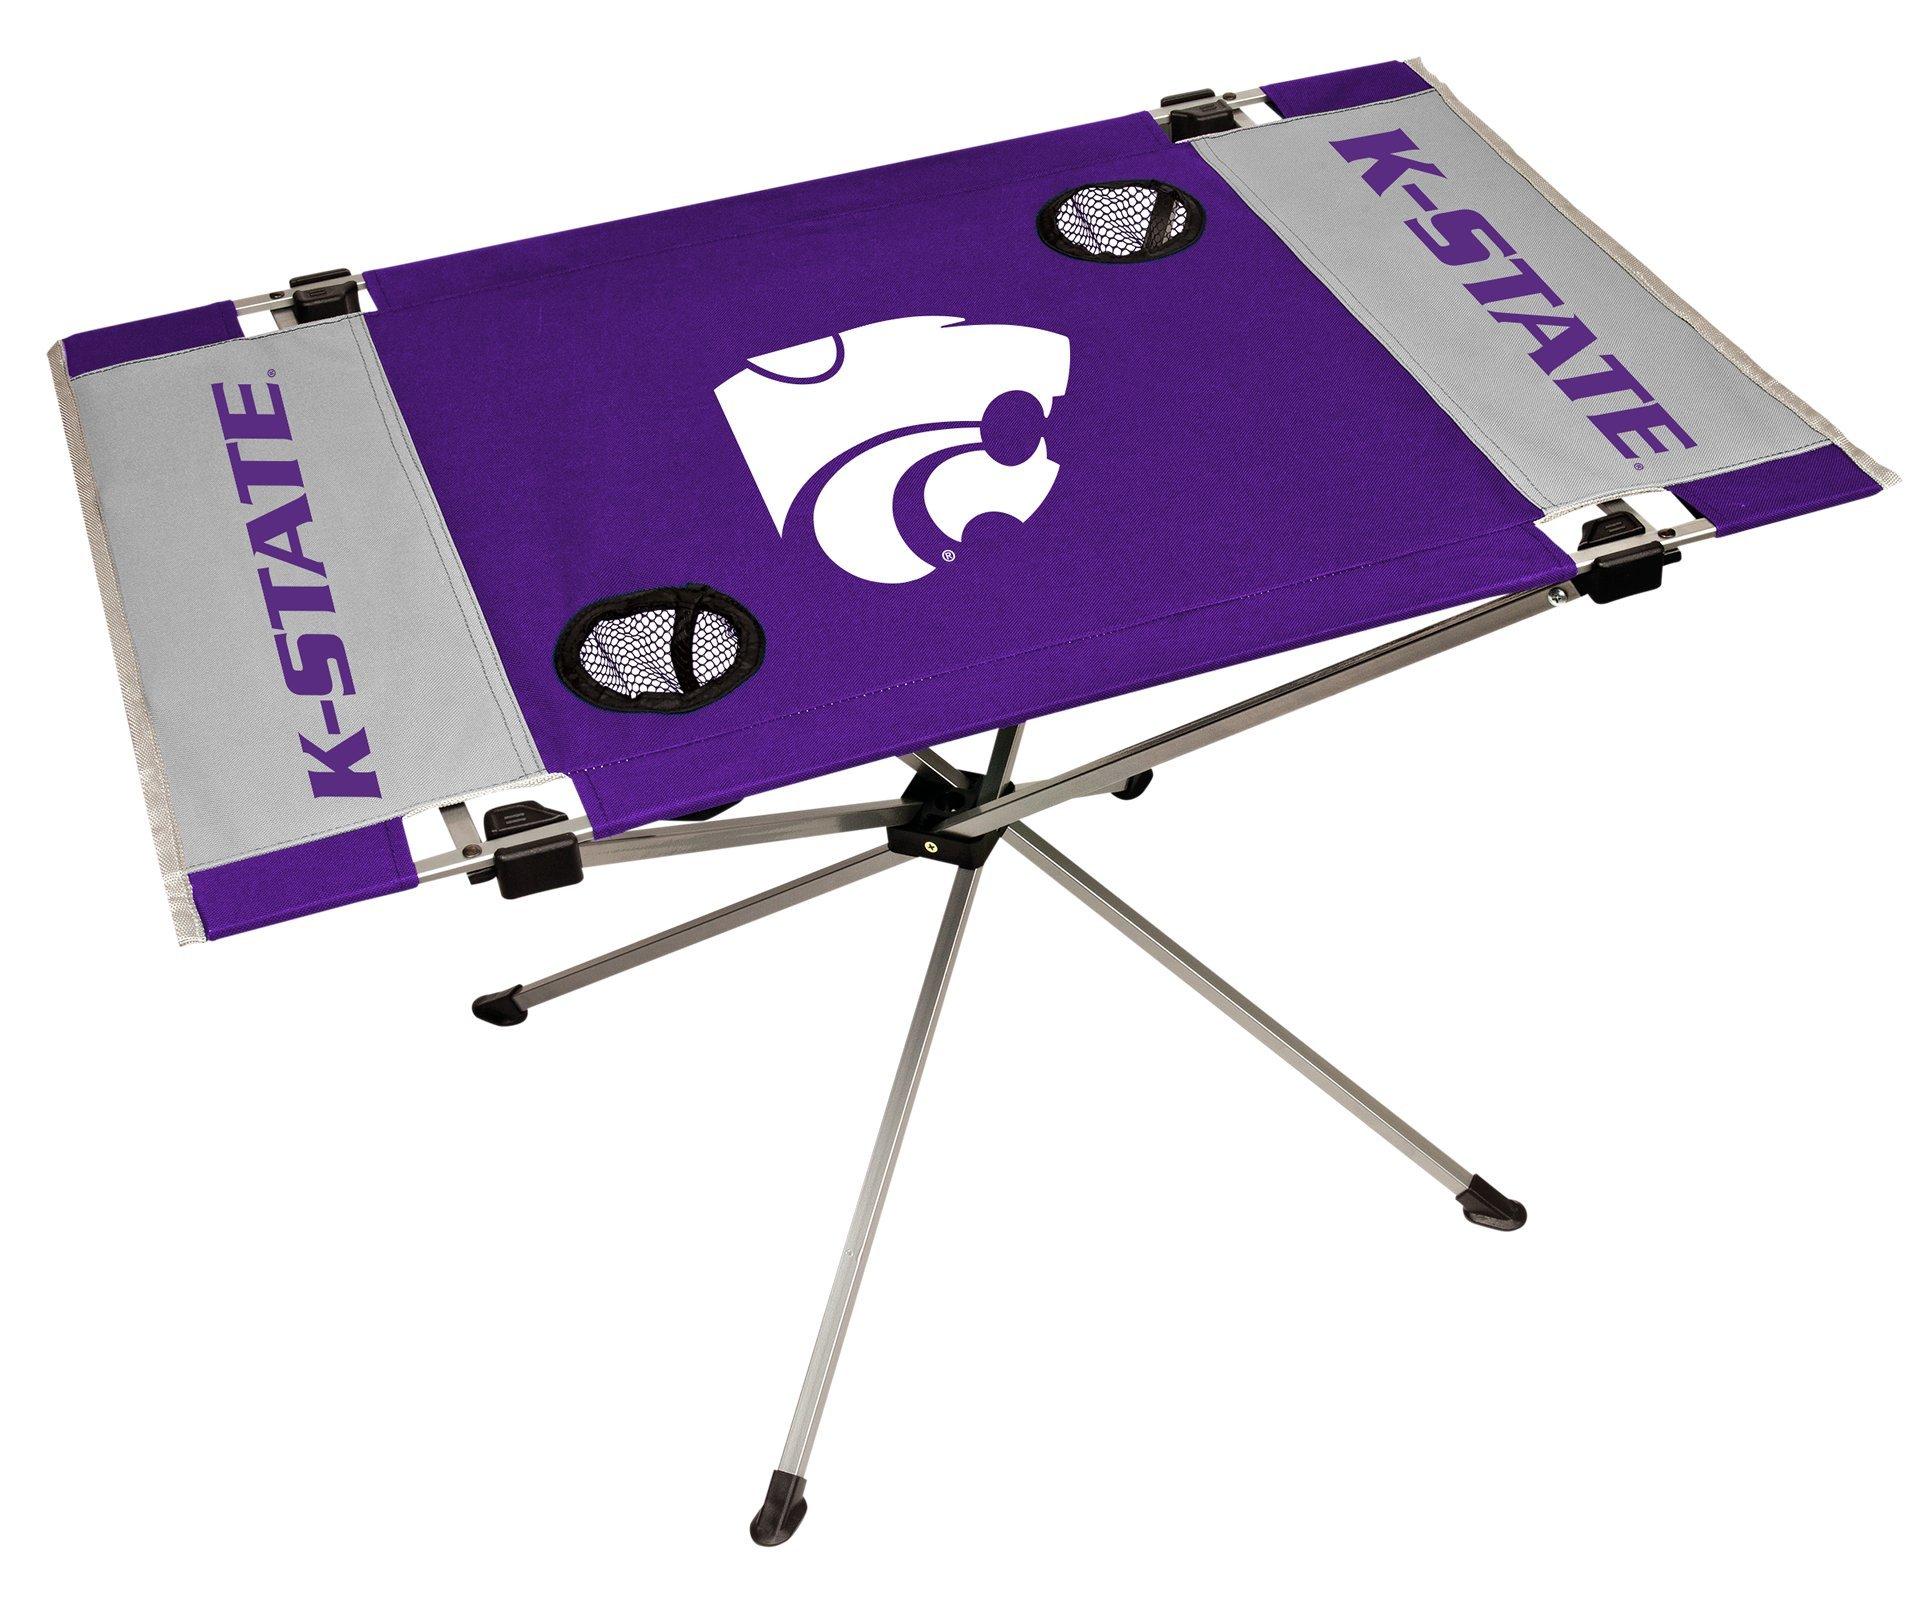 Rawlings NCAA Kansas State Wildcats NCAA Endzone Tailgate Table, Purple, 31.5'' Large x 20.7'' W x 19'' H by Rawlings